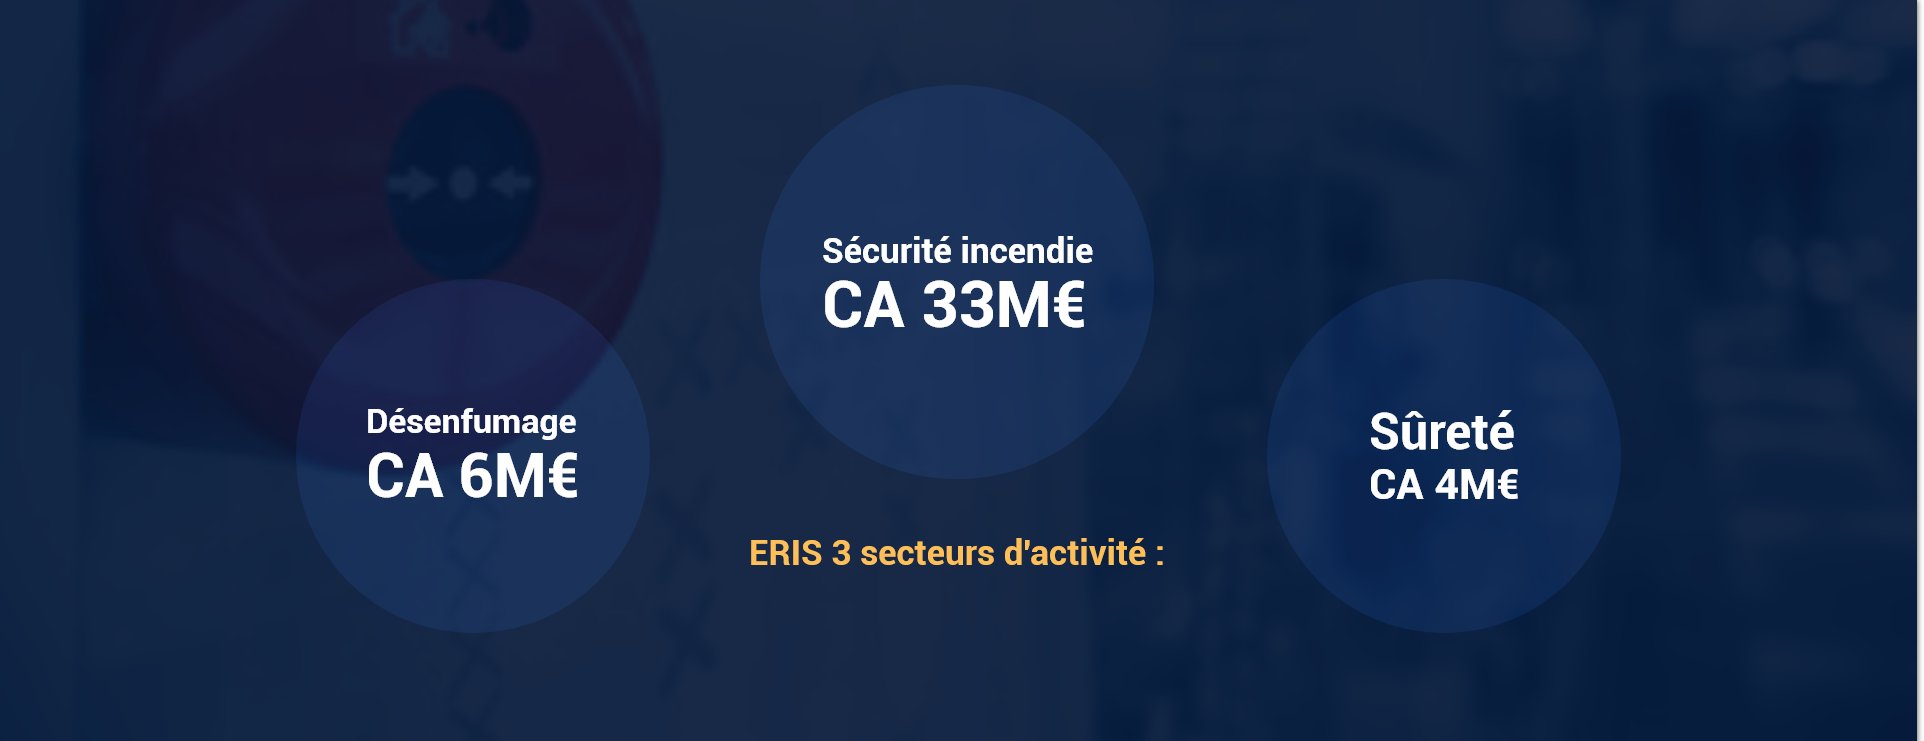 https://www.eris-di.com/wp-content/uploads/2021/06/Bandeau_2021_1.png